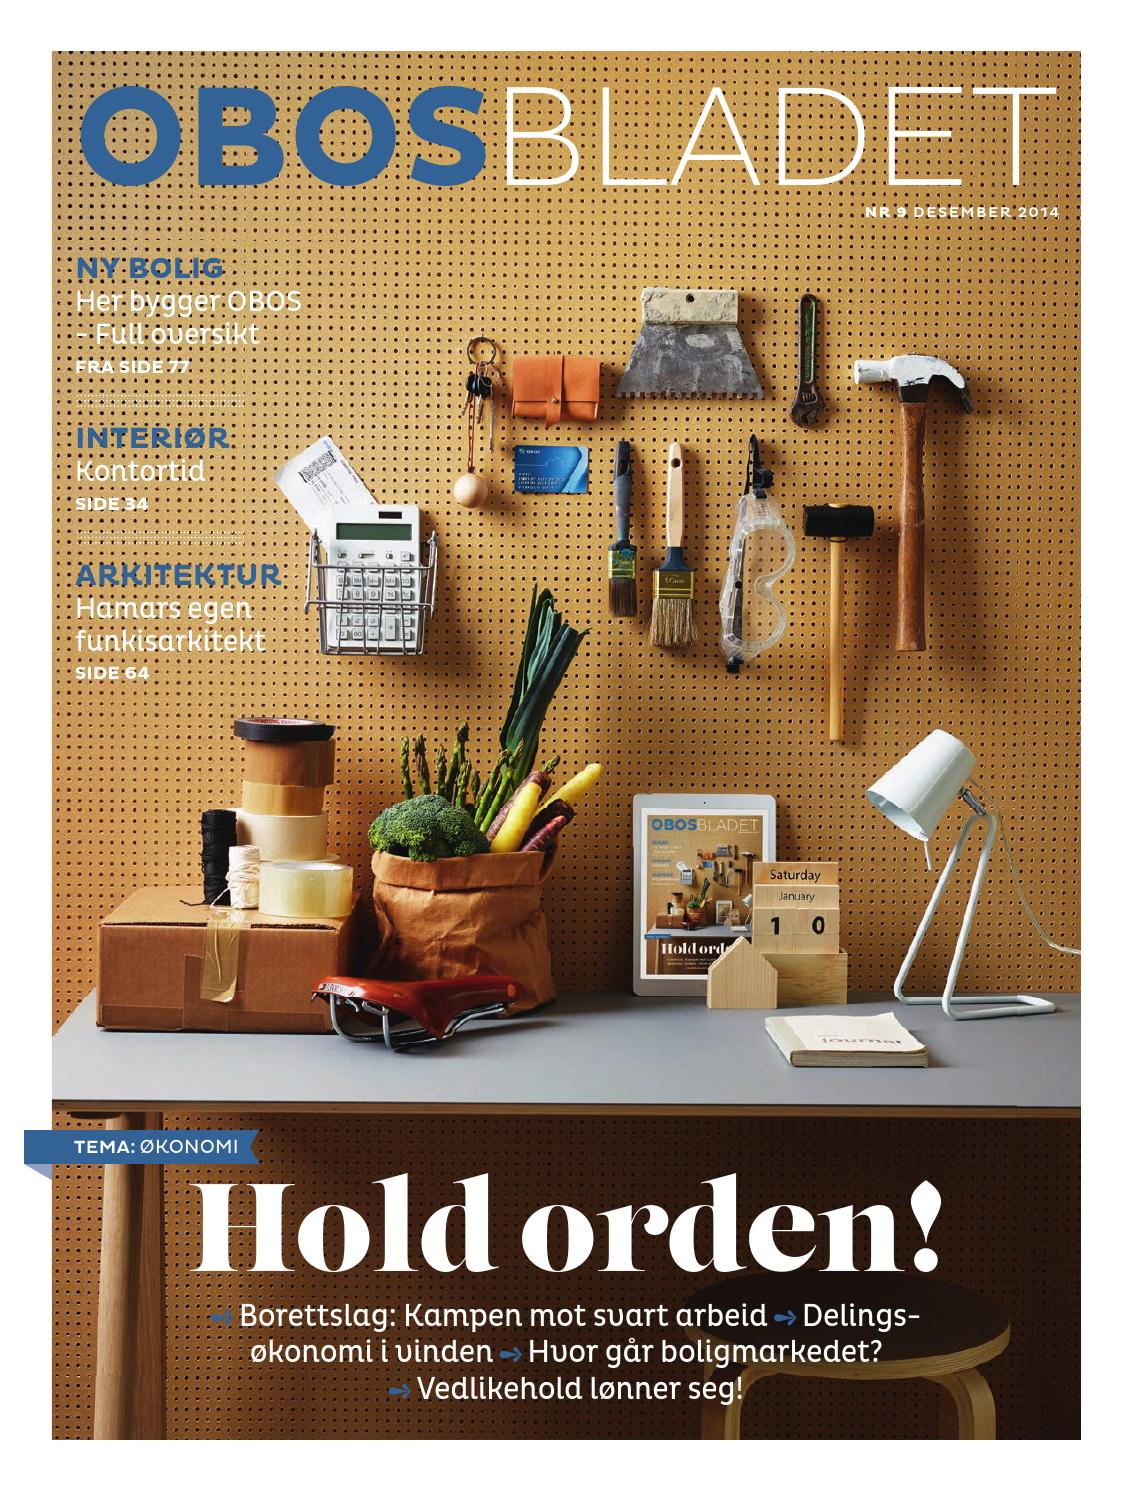 Obos bladet nr 9 2014 by obos bbl   issuu